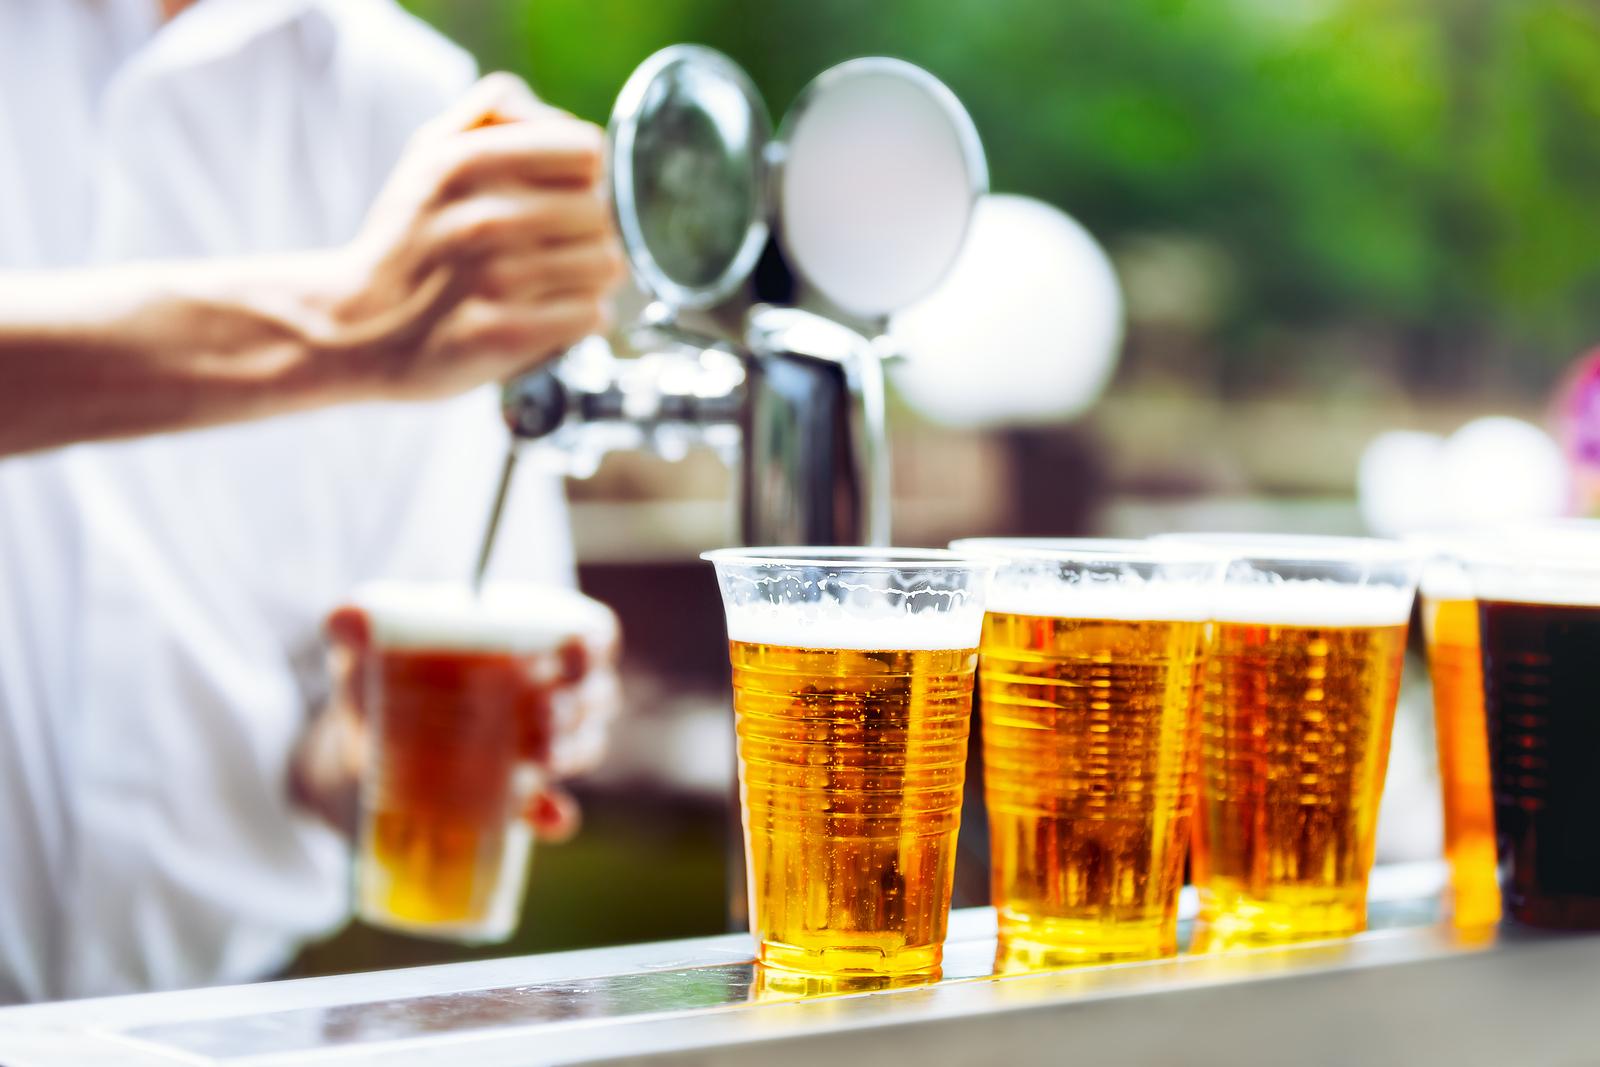 Alcohol Problem Screening Quiz - verywellmind.com